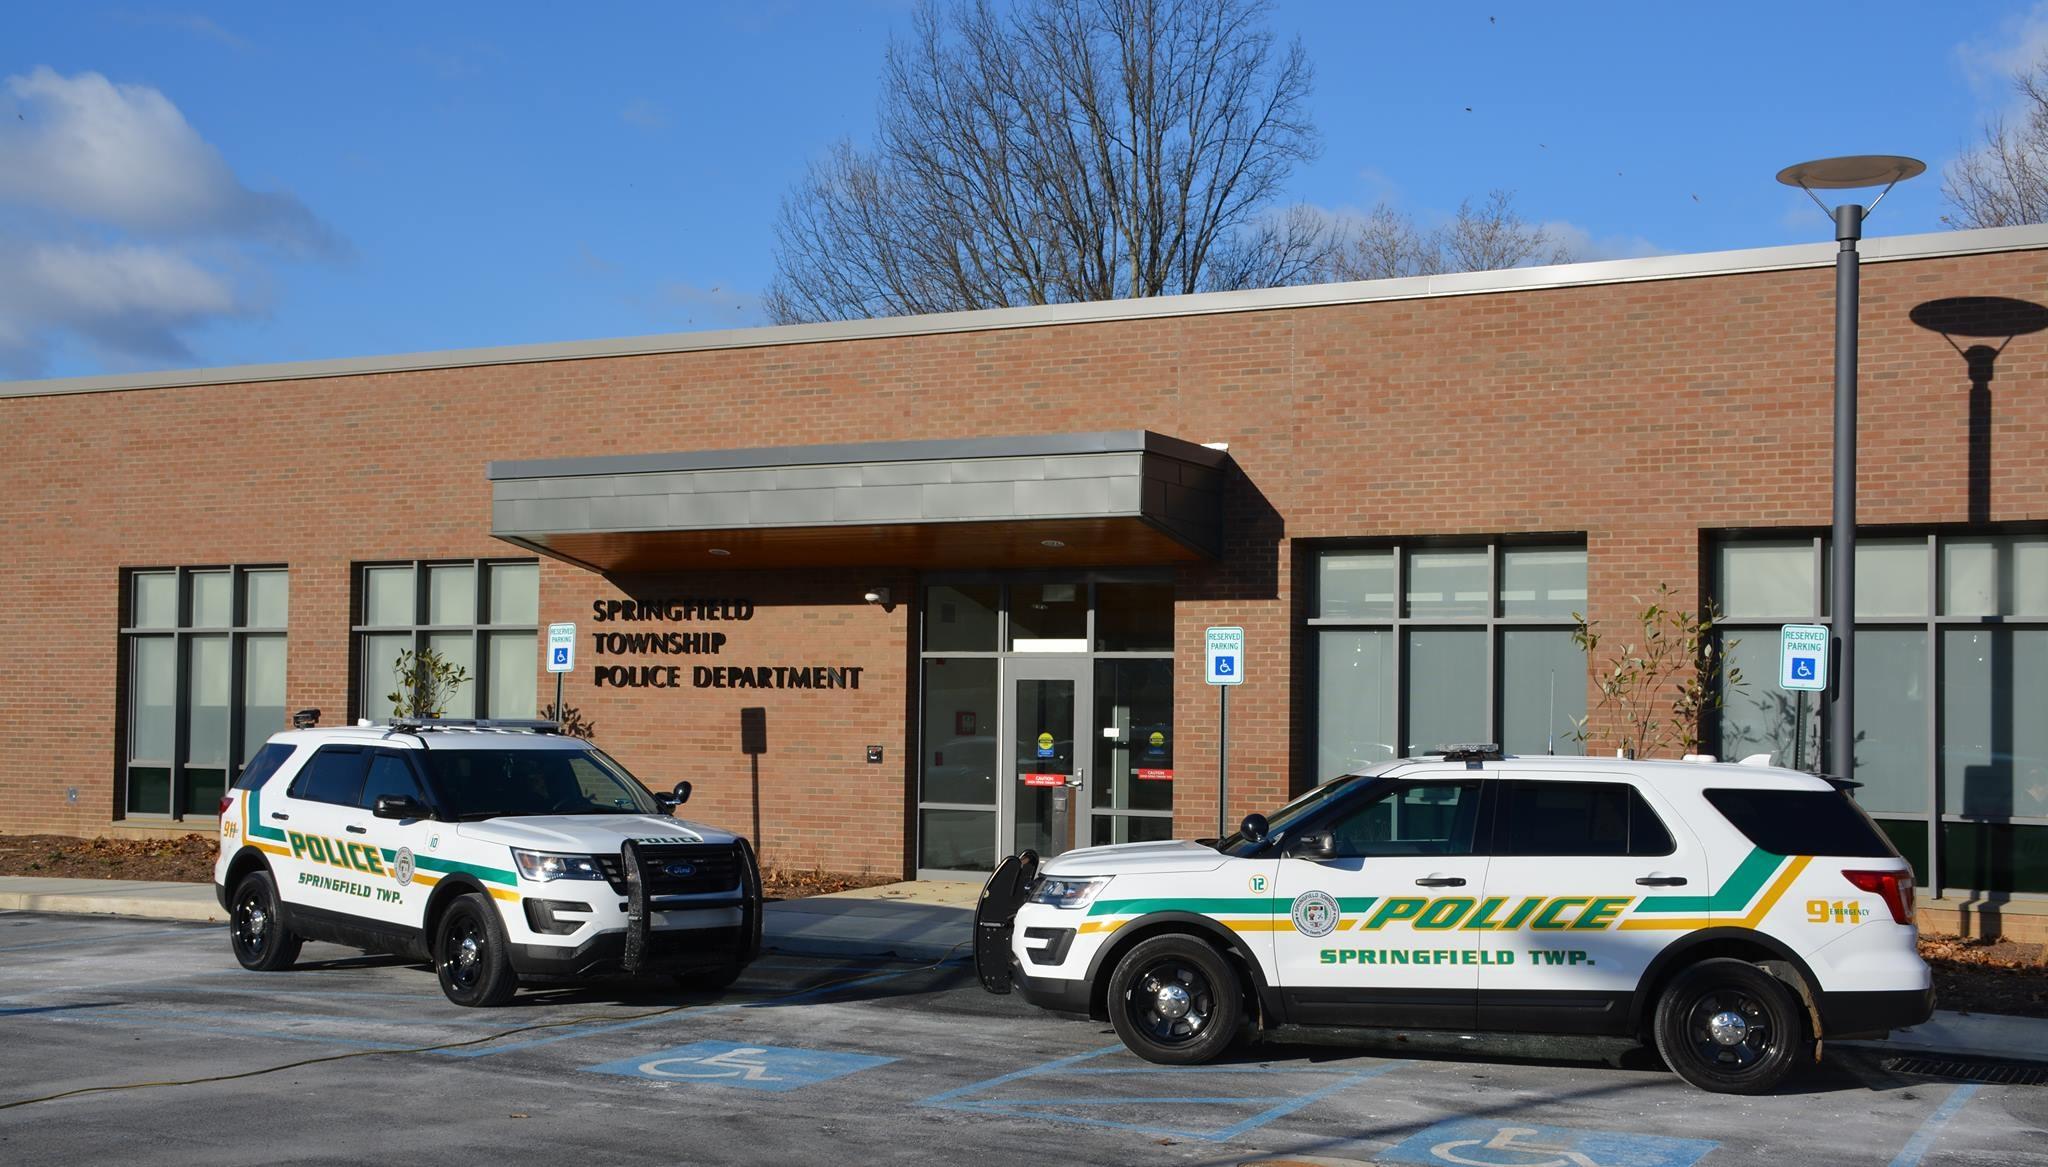 Springfield Township Police.jpg